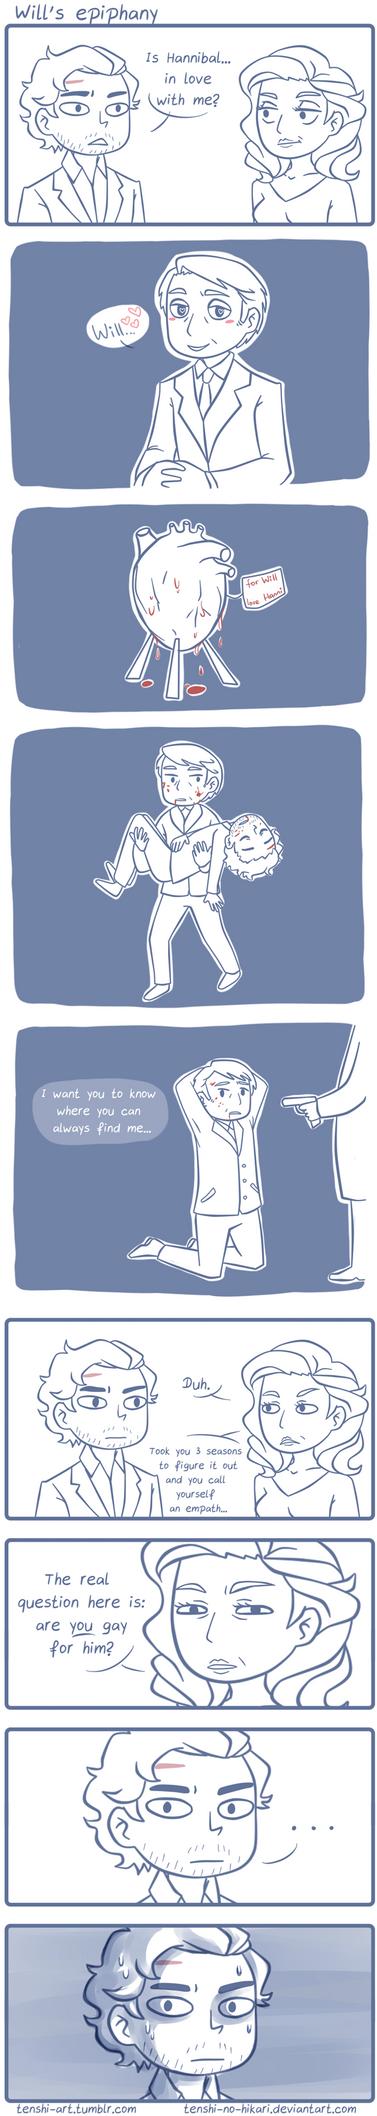 Will's epiphany by Tenshi-no-Hikari